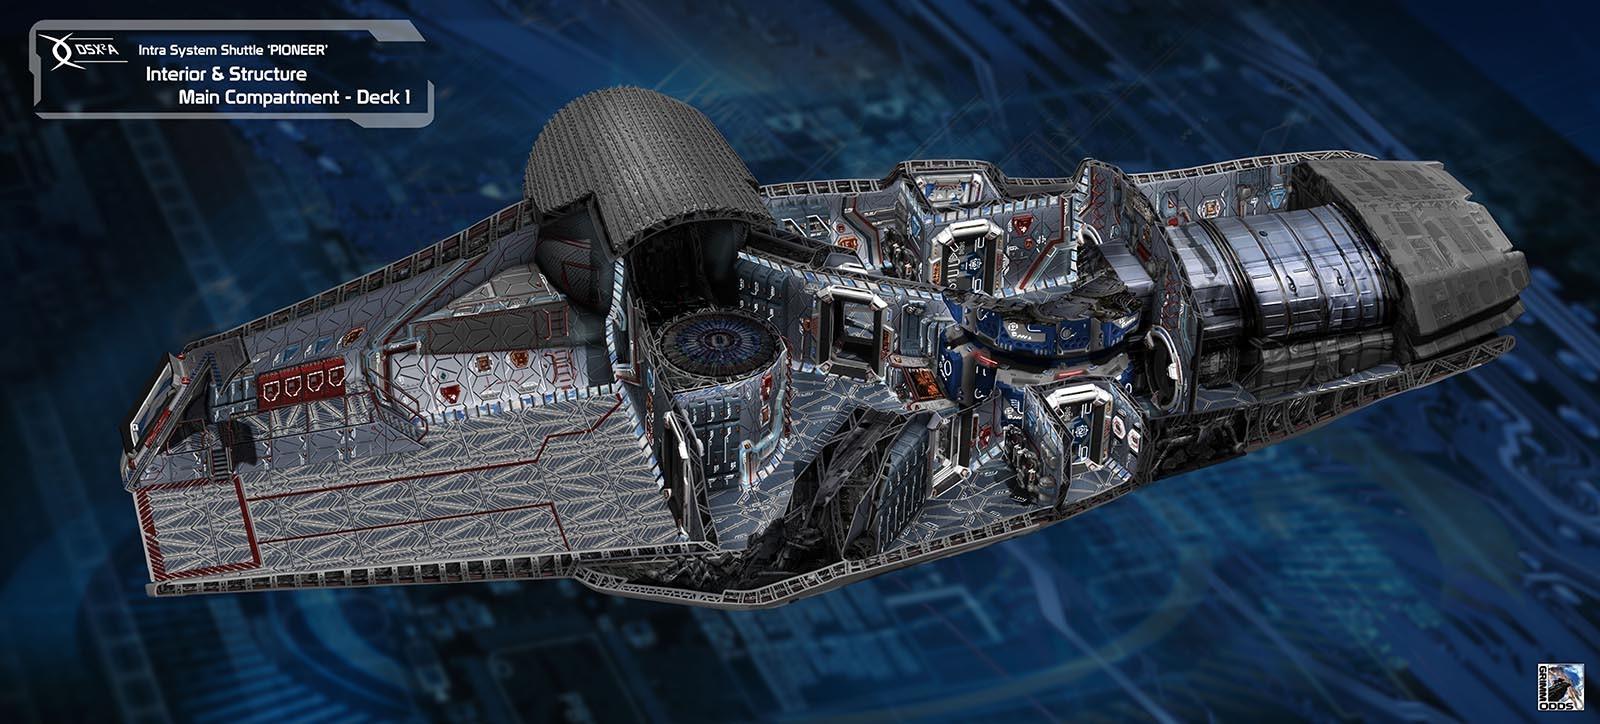 Grimm Odds - Shuttle Interior - Main